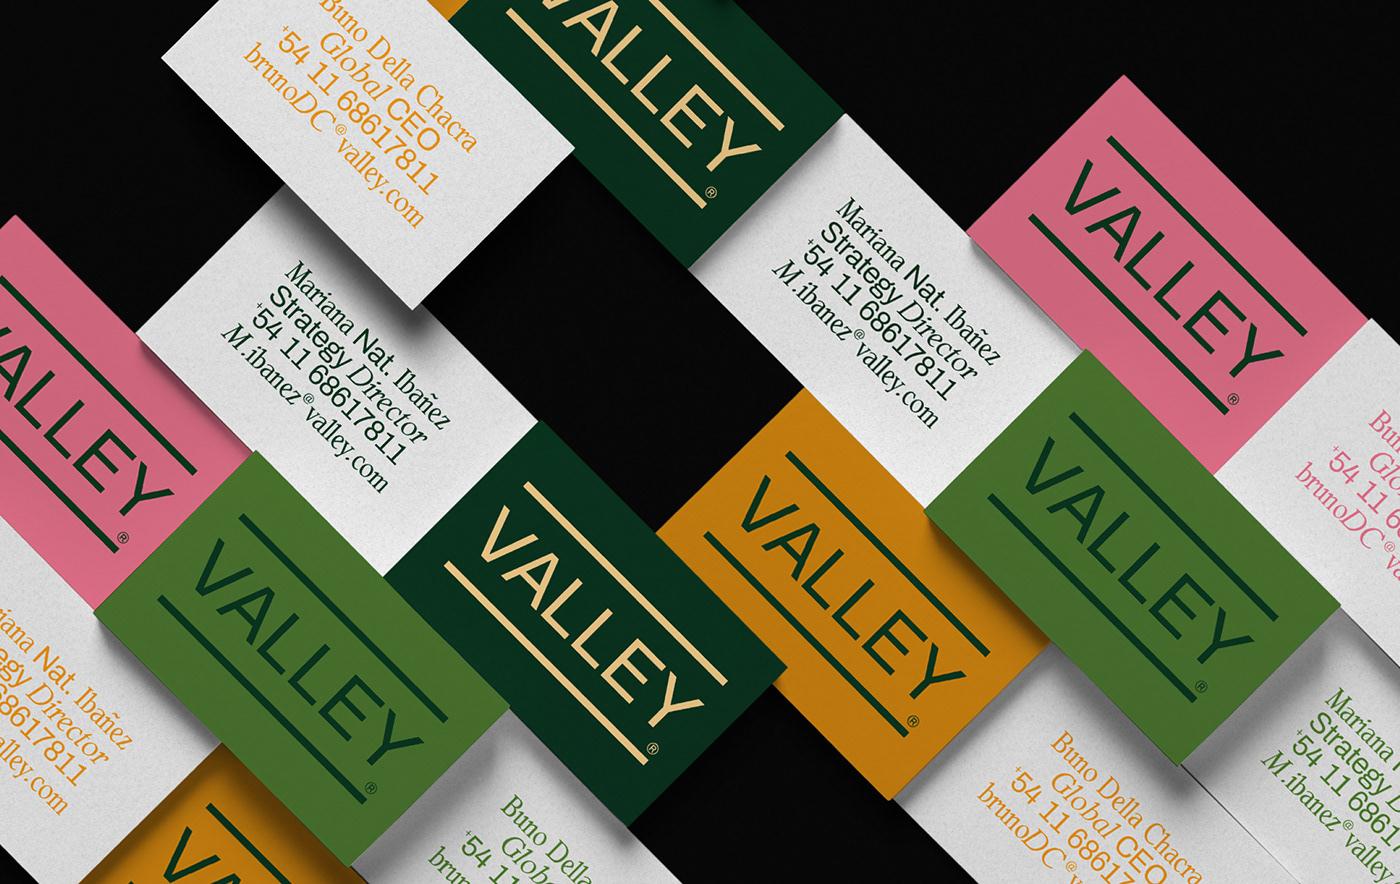 brand identity branding  graphic design  grid identity Illustrator Layout real estate typography   visual